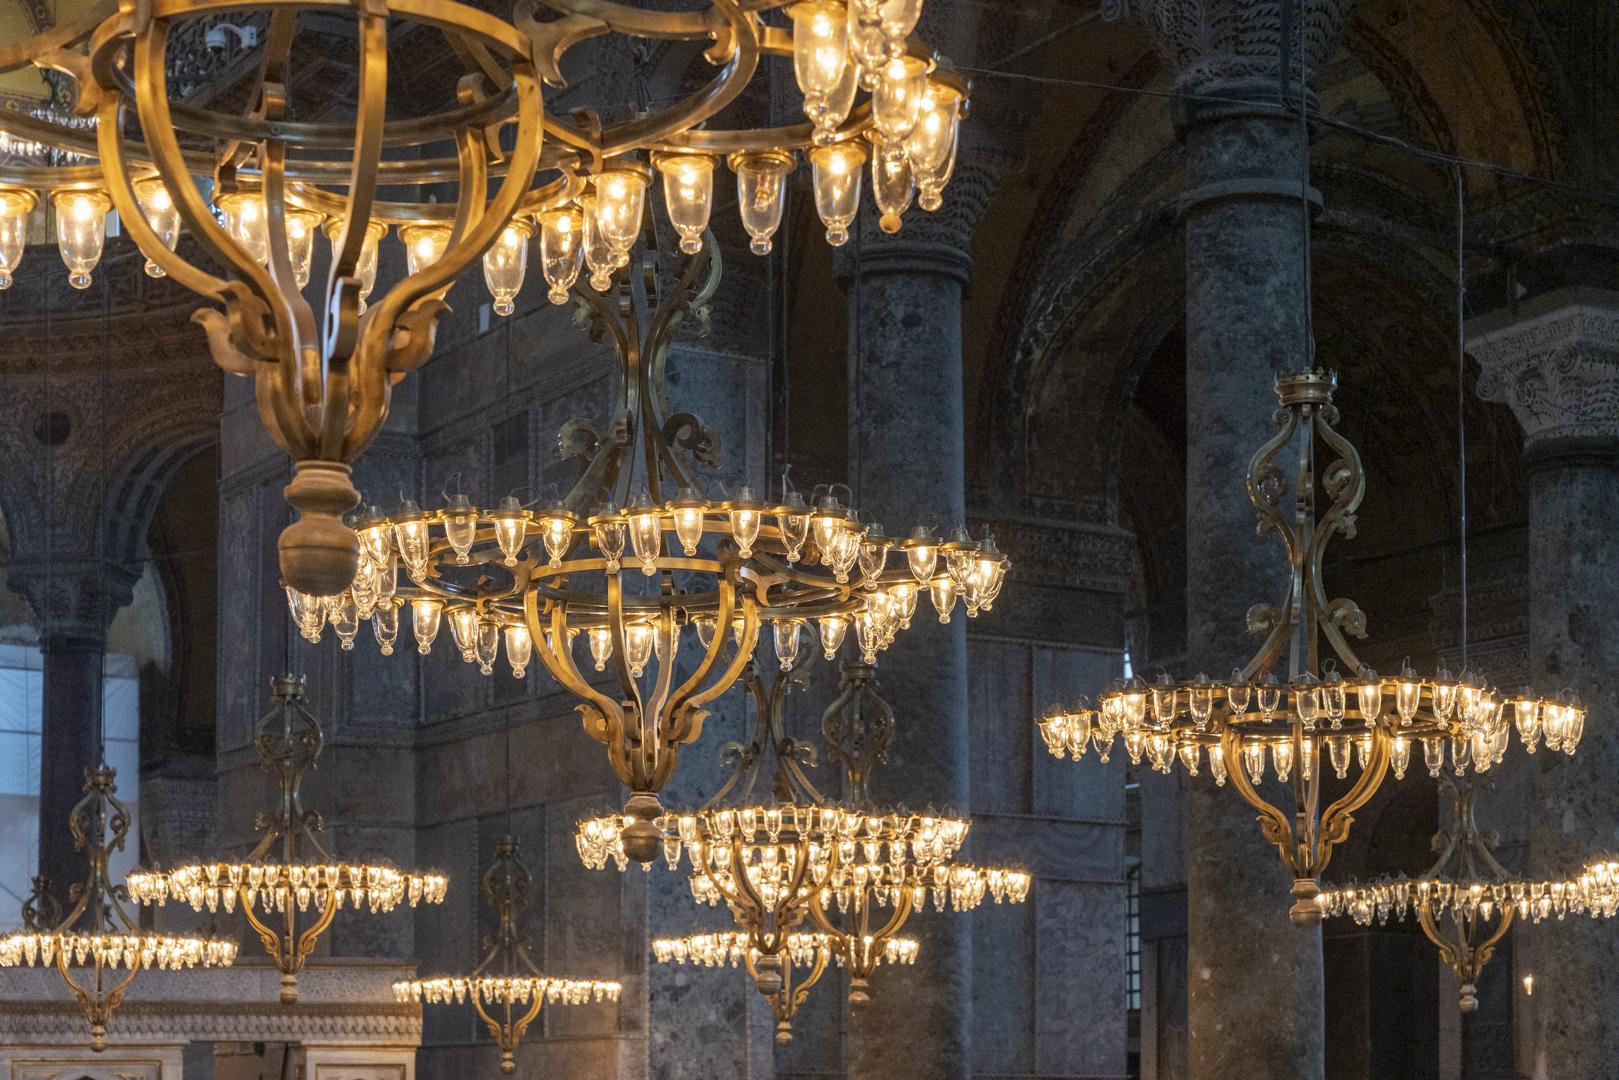 Monumente Hagia Sofia Istanbul Leuchter von Fotograf Michael Pinzolits